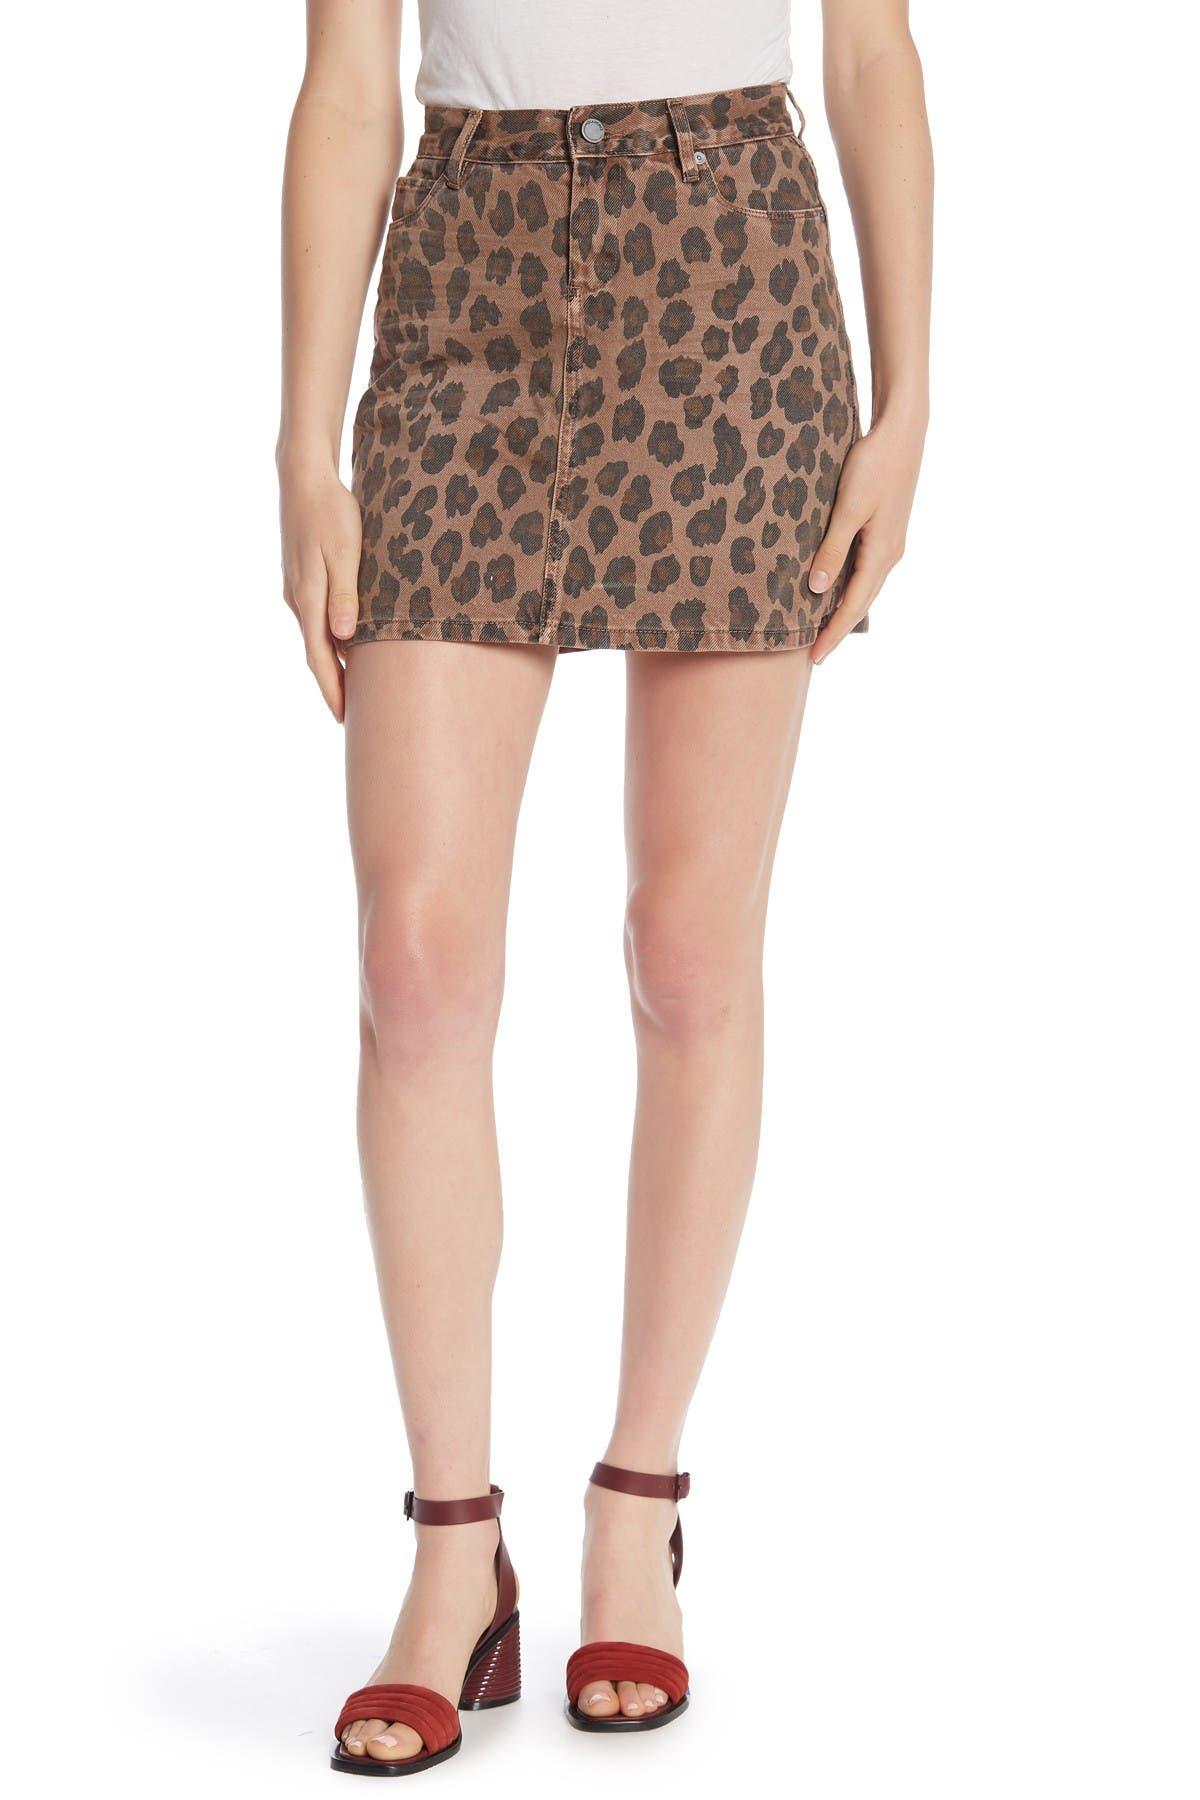 Image of BLANKNYC Denim Leopard Print Denim Mini Skirt